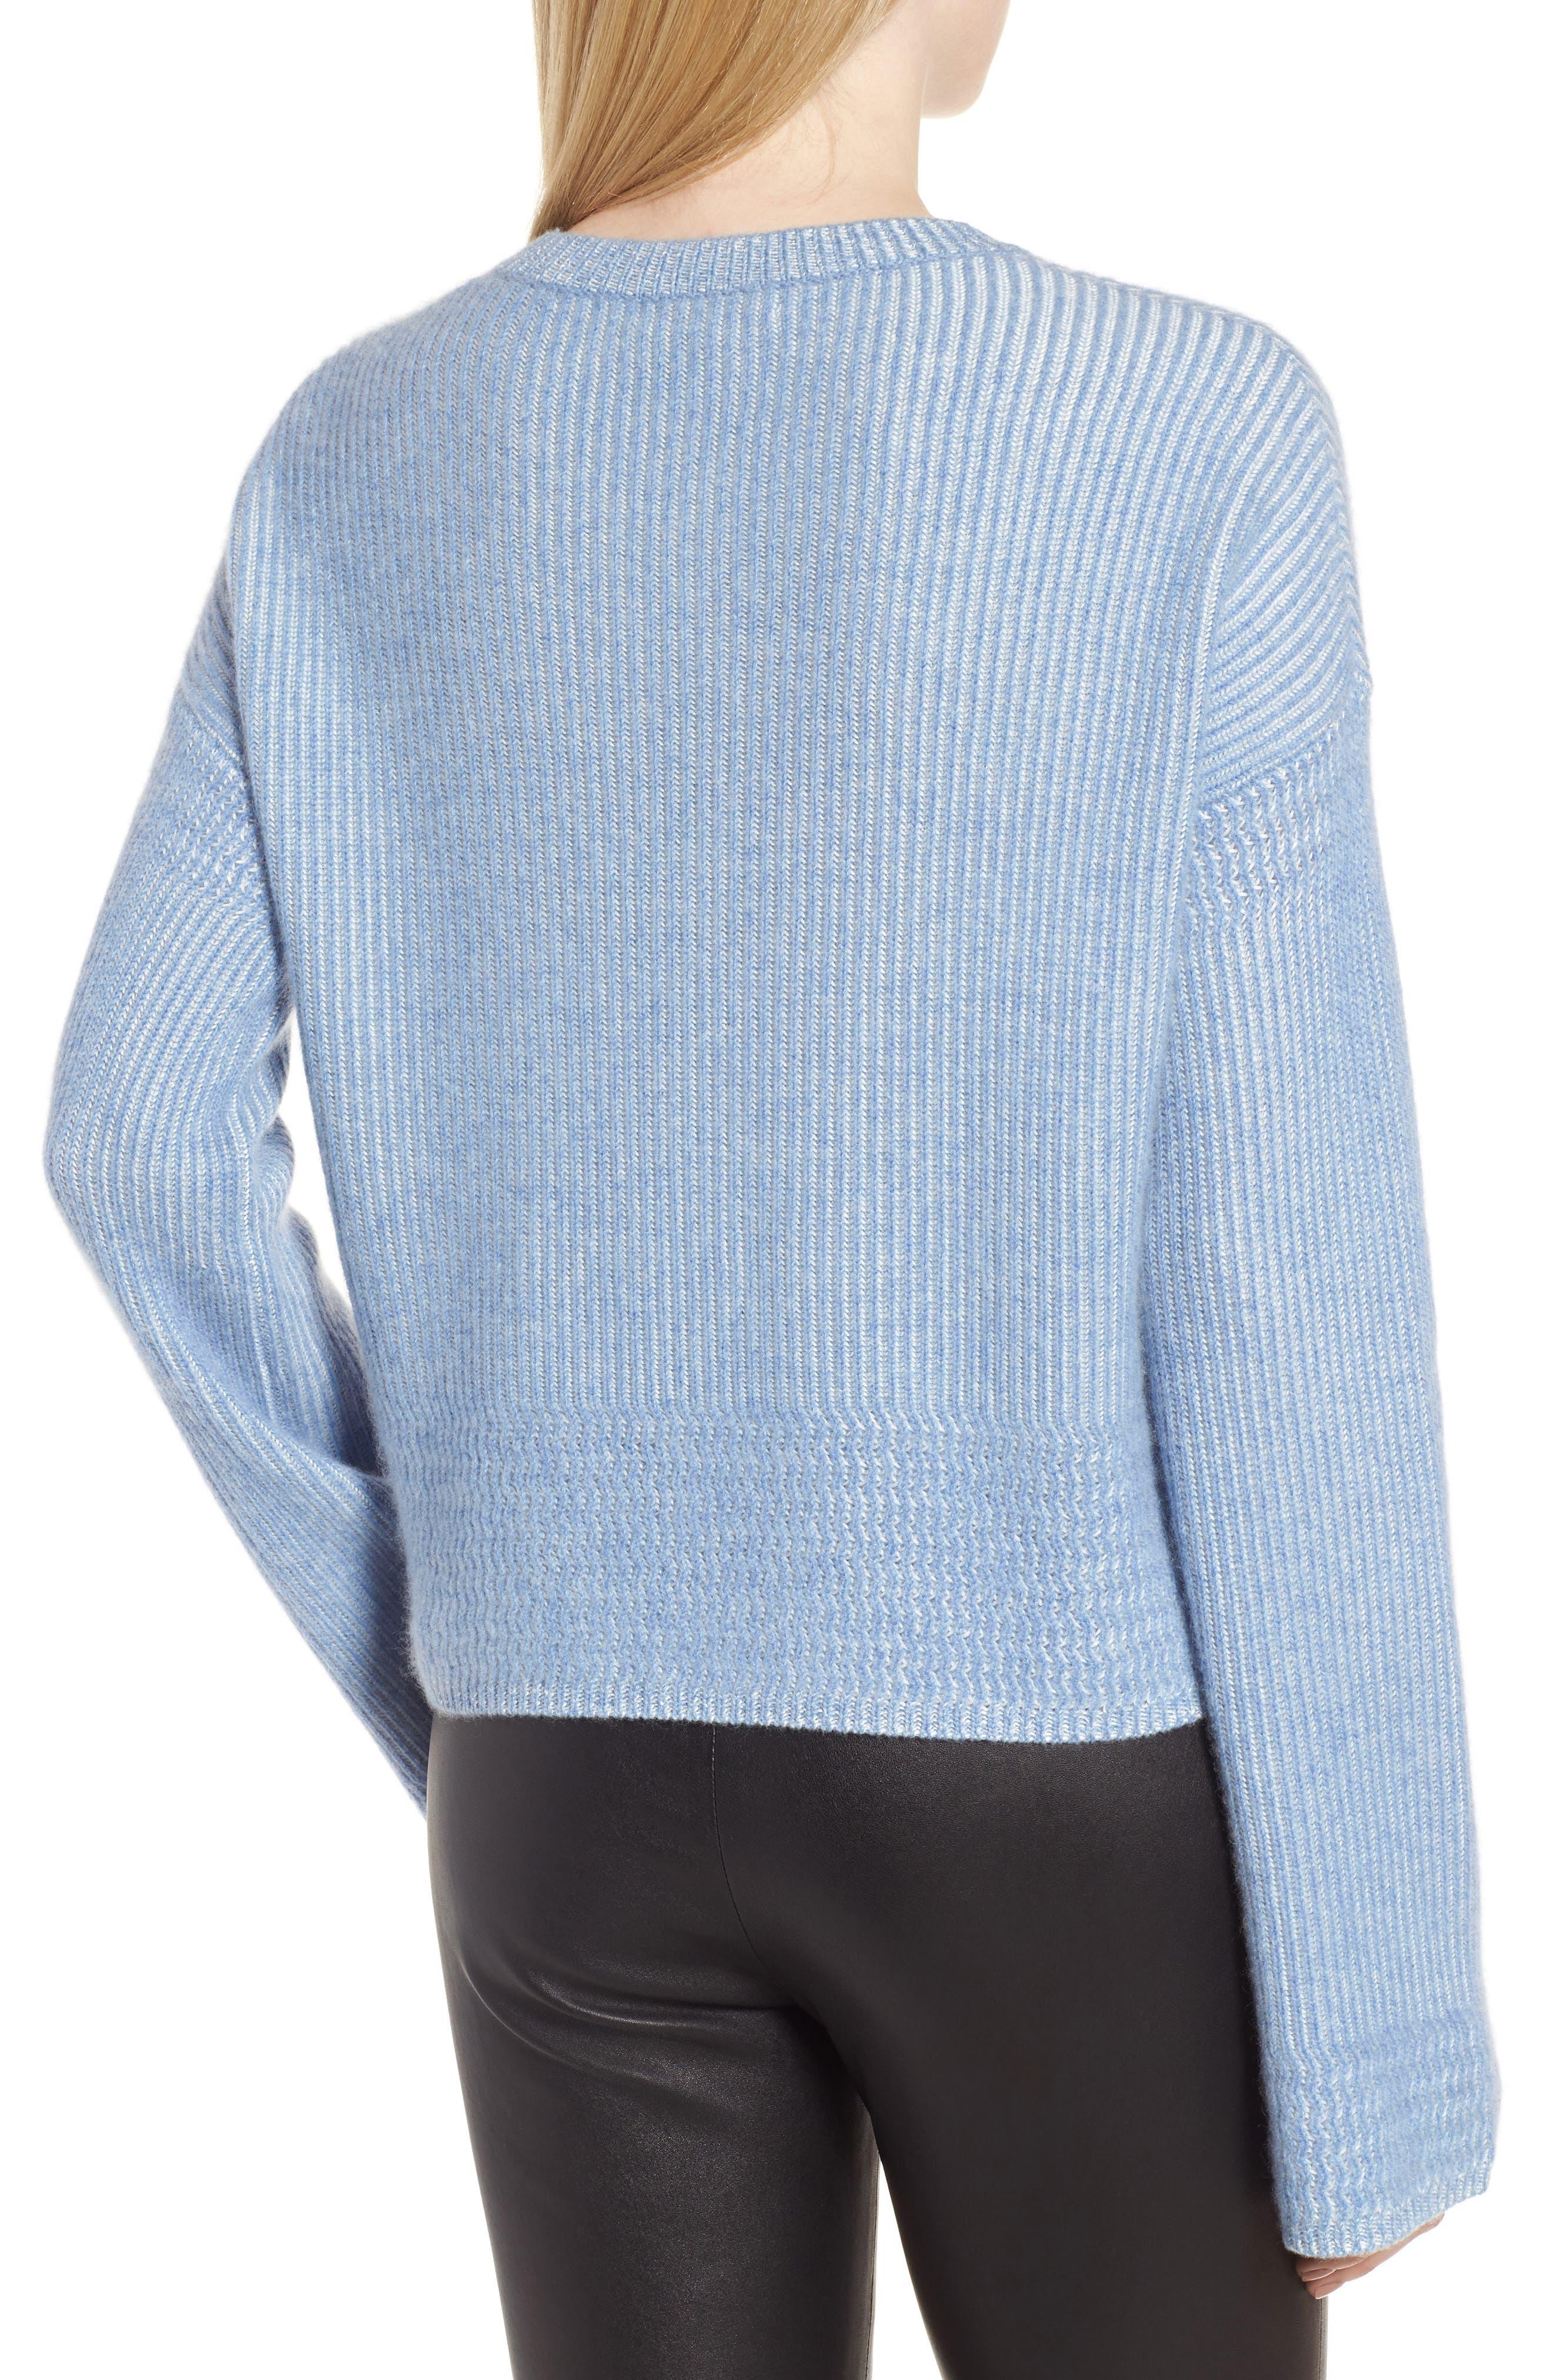 Alternate Image 2  - Nordstrom Signature Cashmere & Silk Blend Plaited Pullover